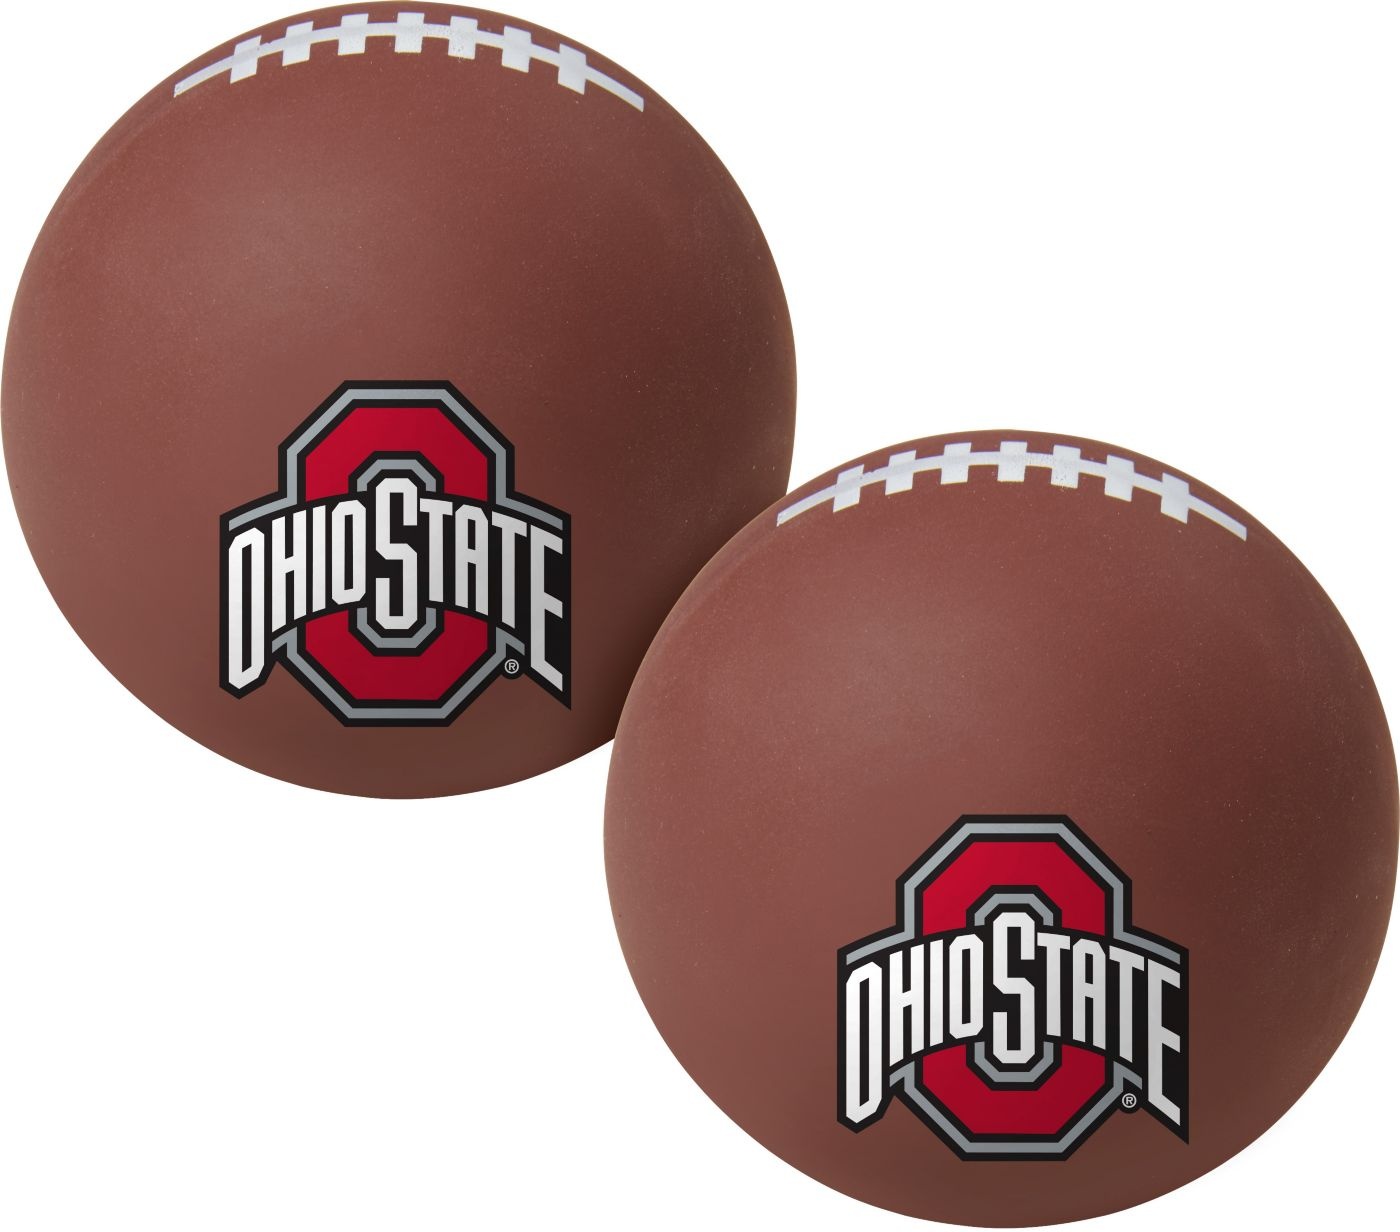 Rawlings Ohio State Buckeyes Football Bouncy Ball